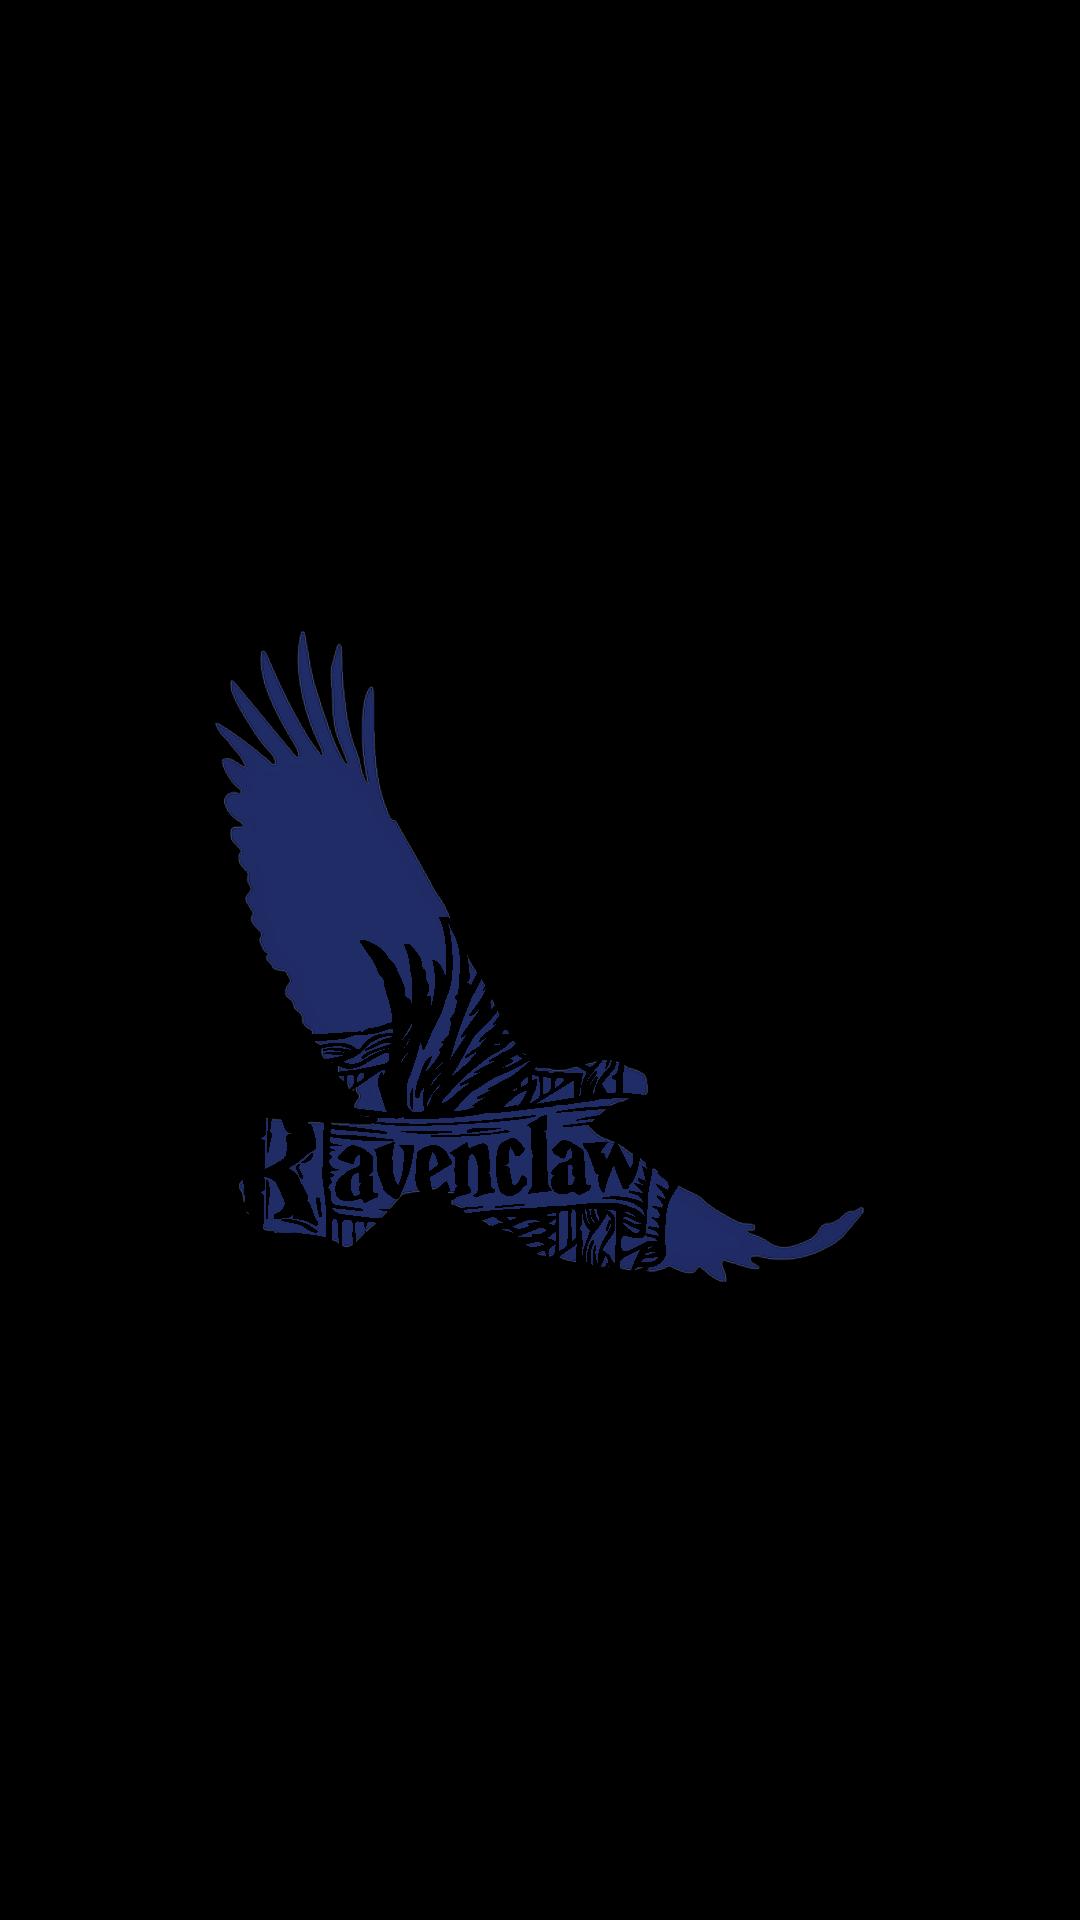 Patrxnus Harry Potter Ravenclaw Harry Potter Wallpaper Ravenclaw